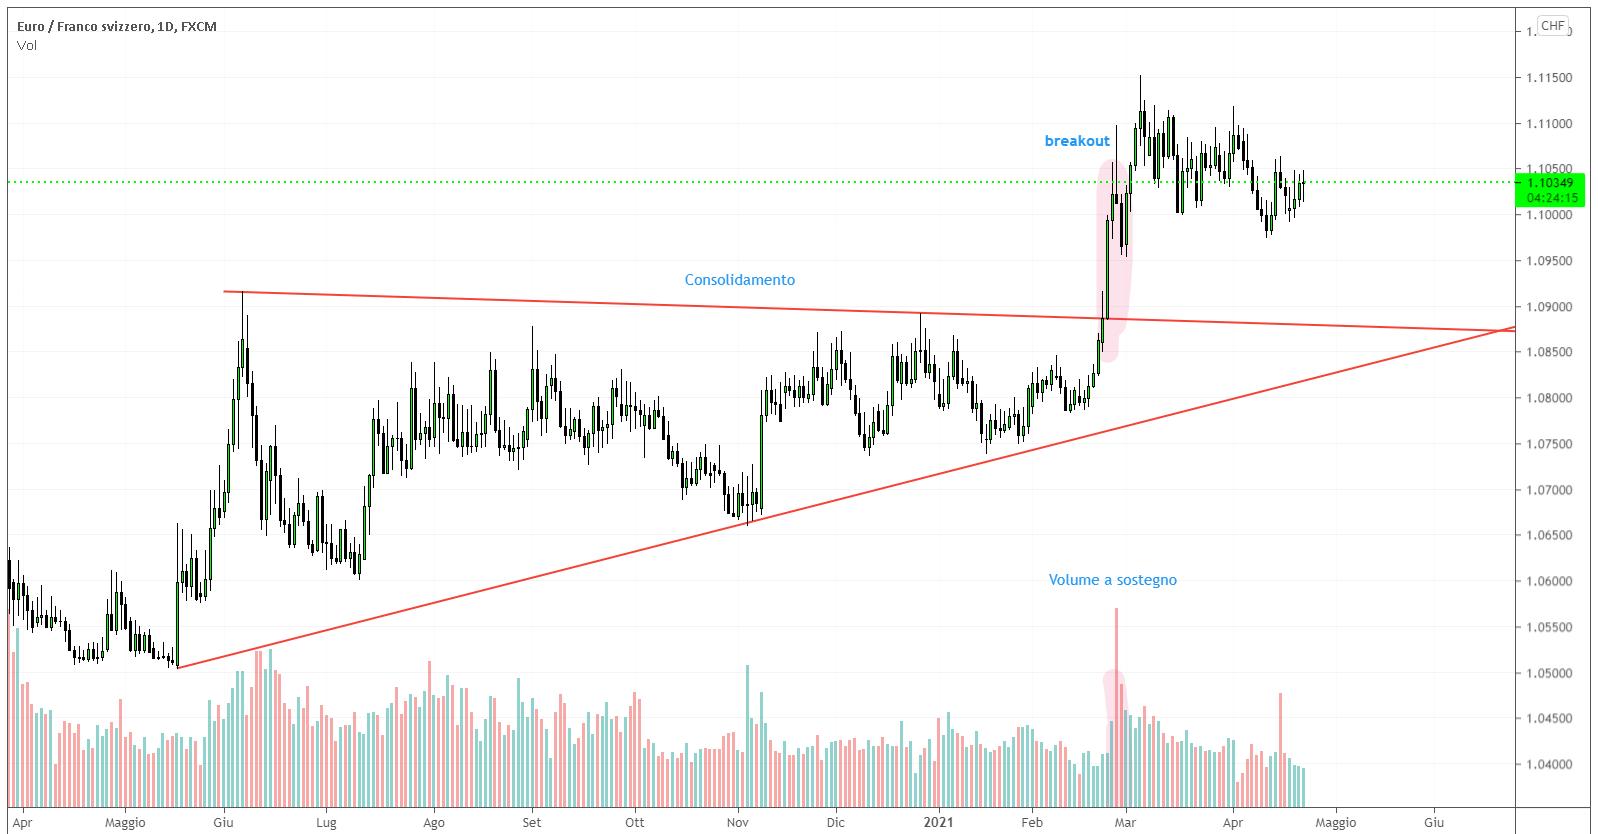 Breakout su EUR/CHF